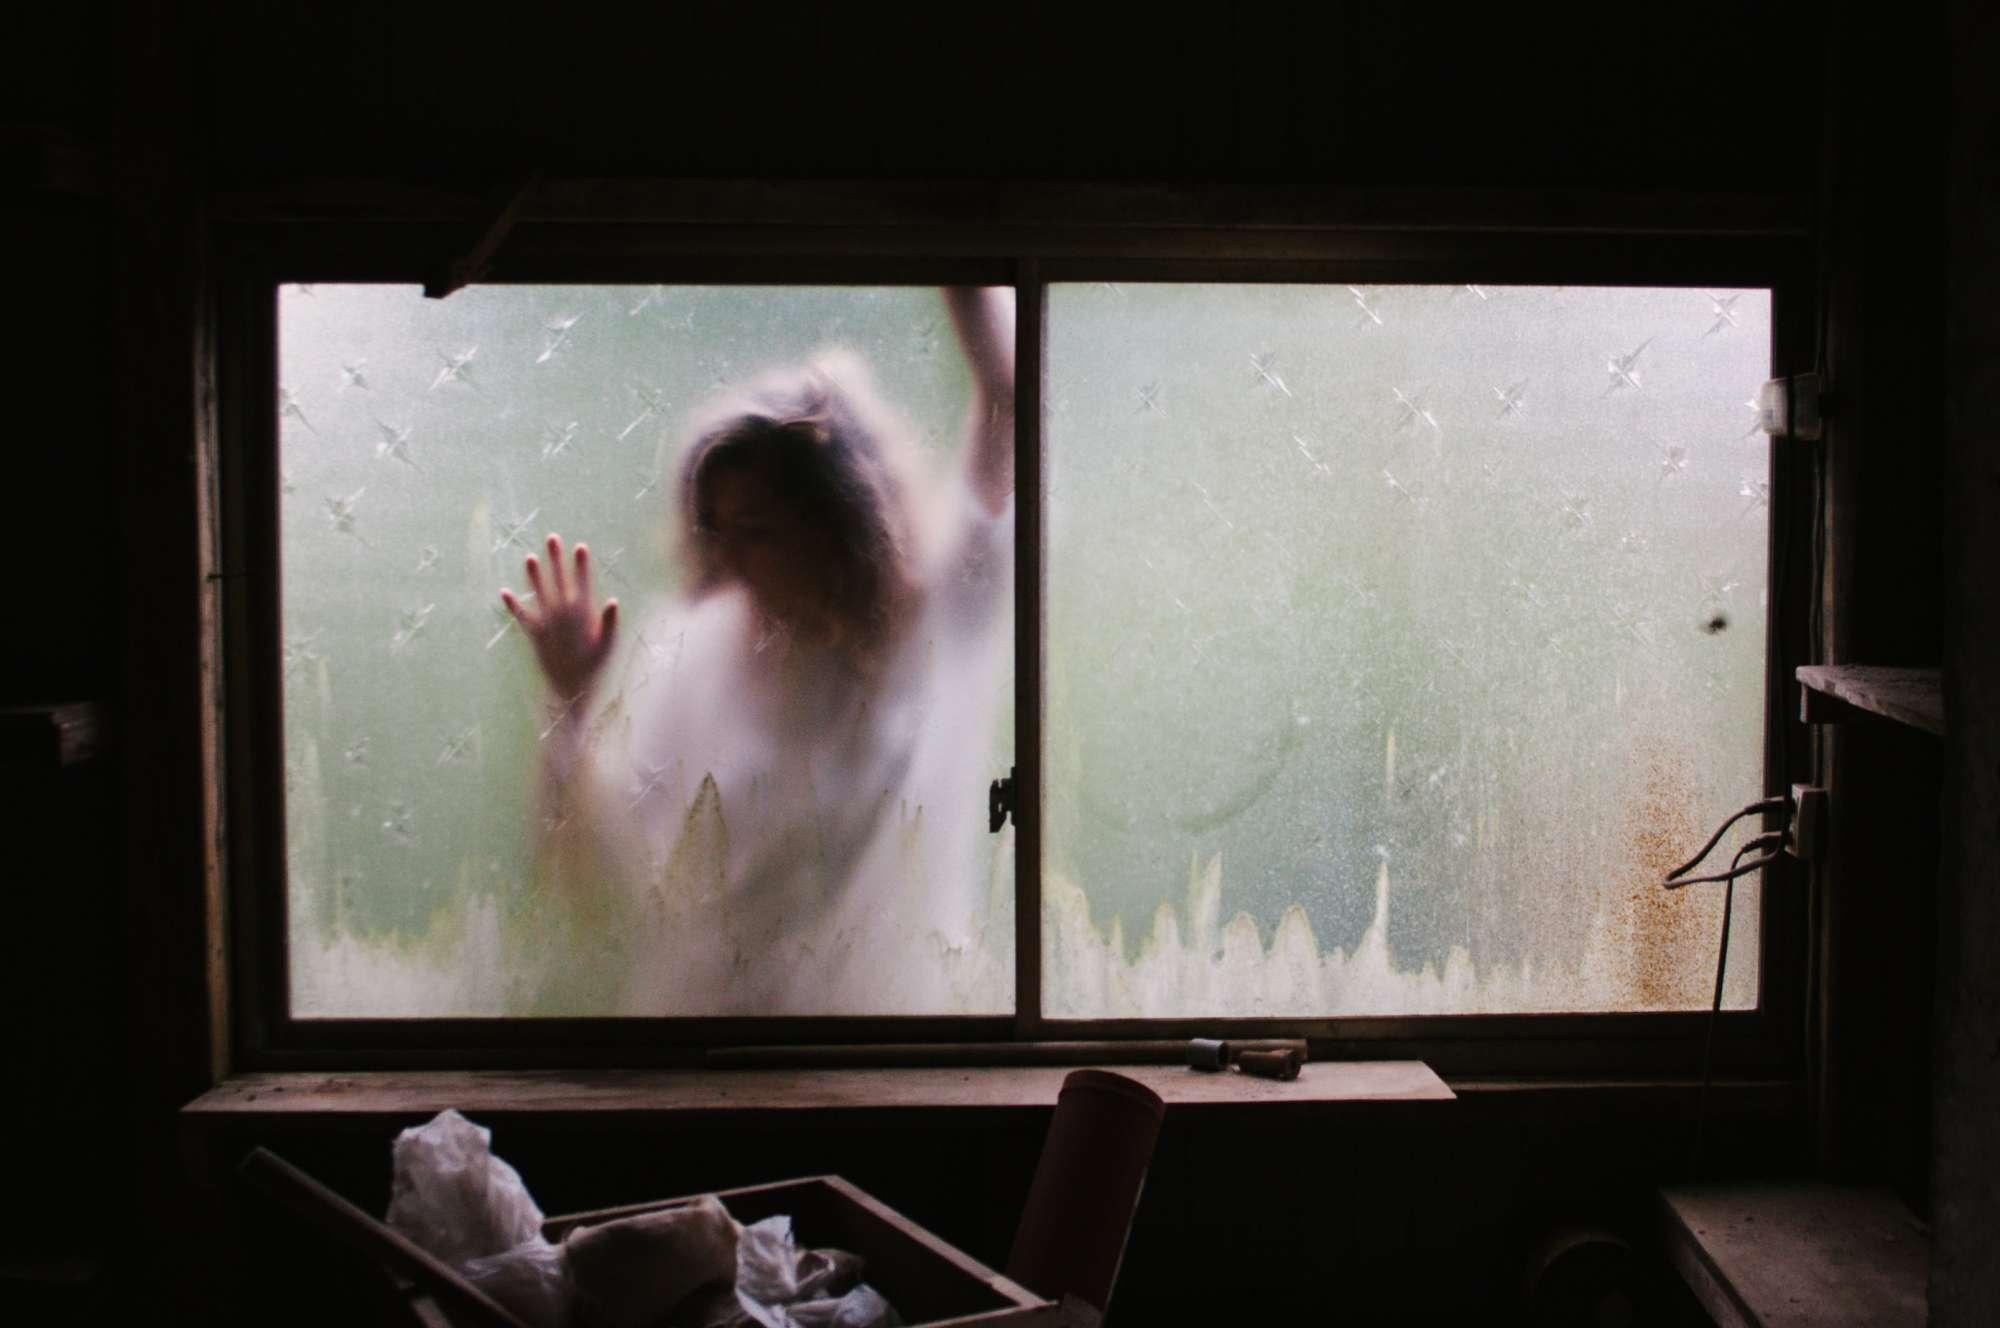 Woman behind a blurry window